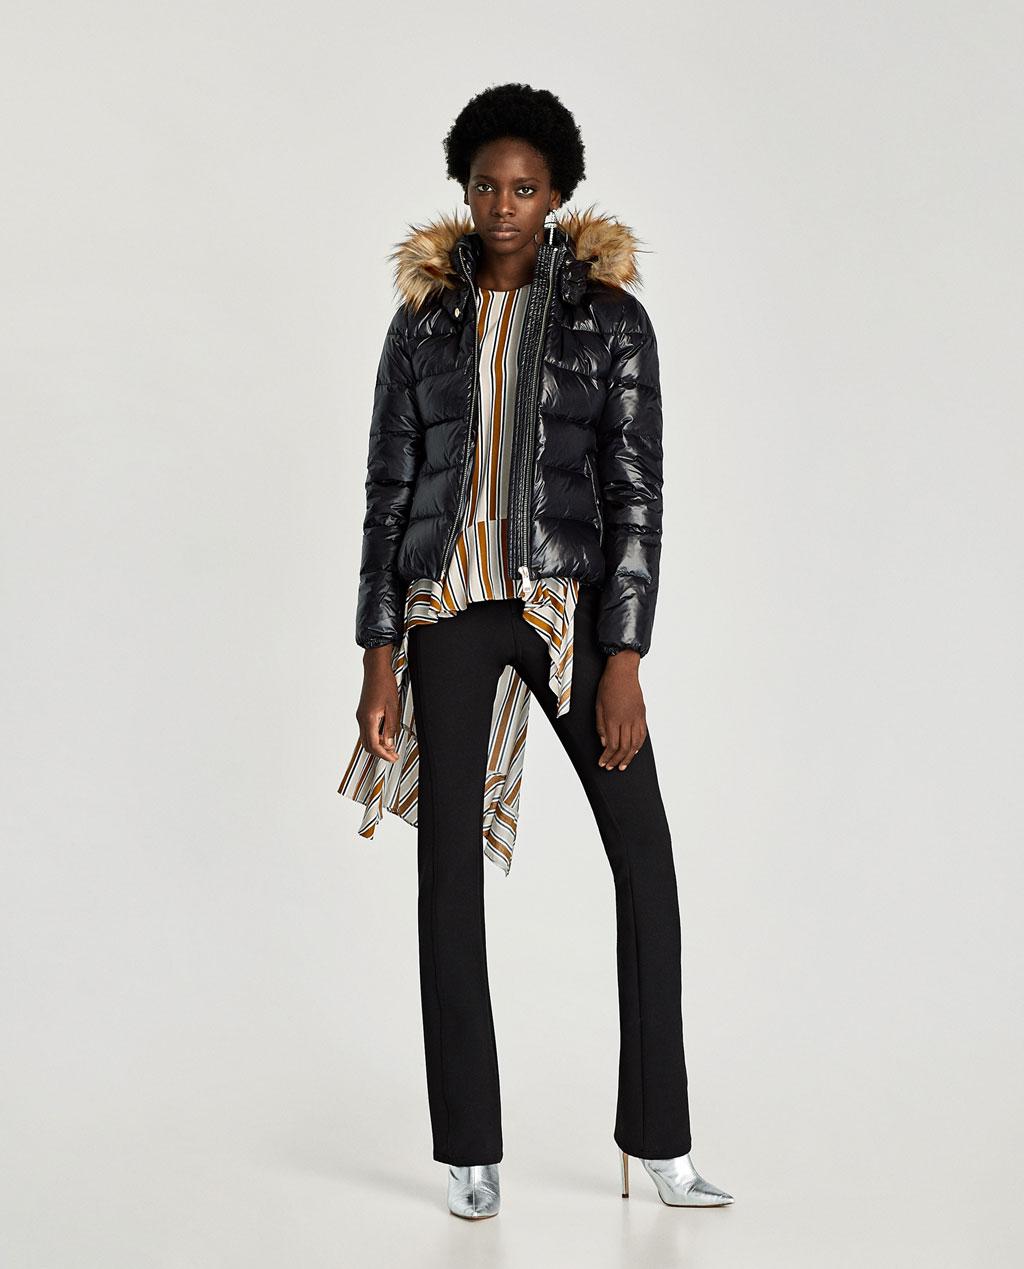 Giaccone imbottito Zara inverno 2017 2018 prezzo 69 95 euro